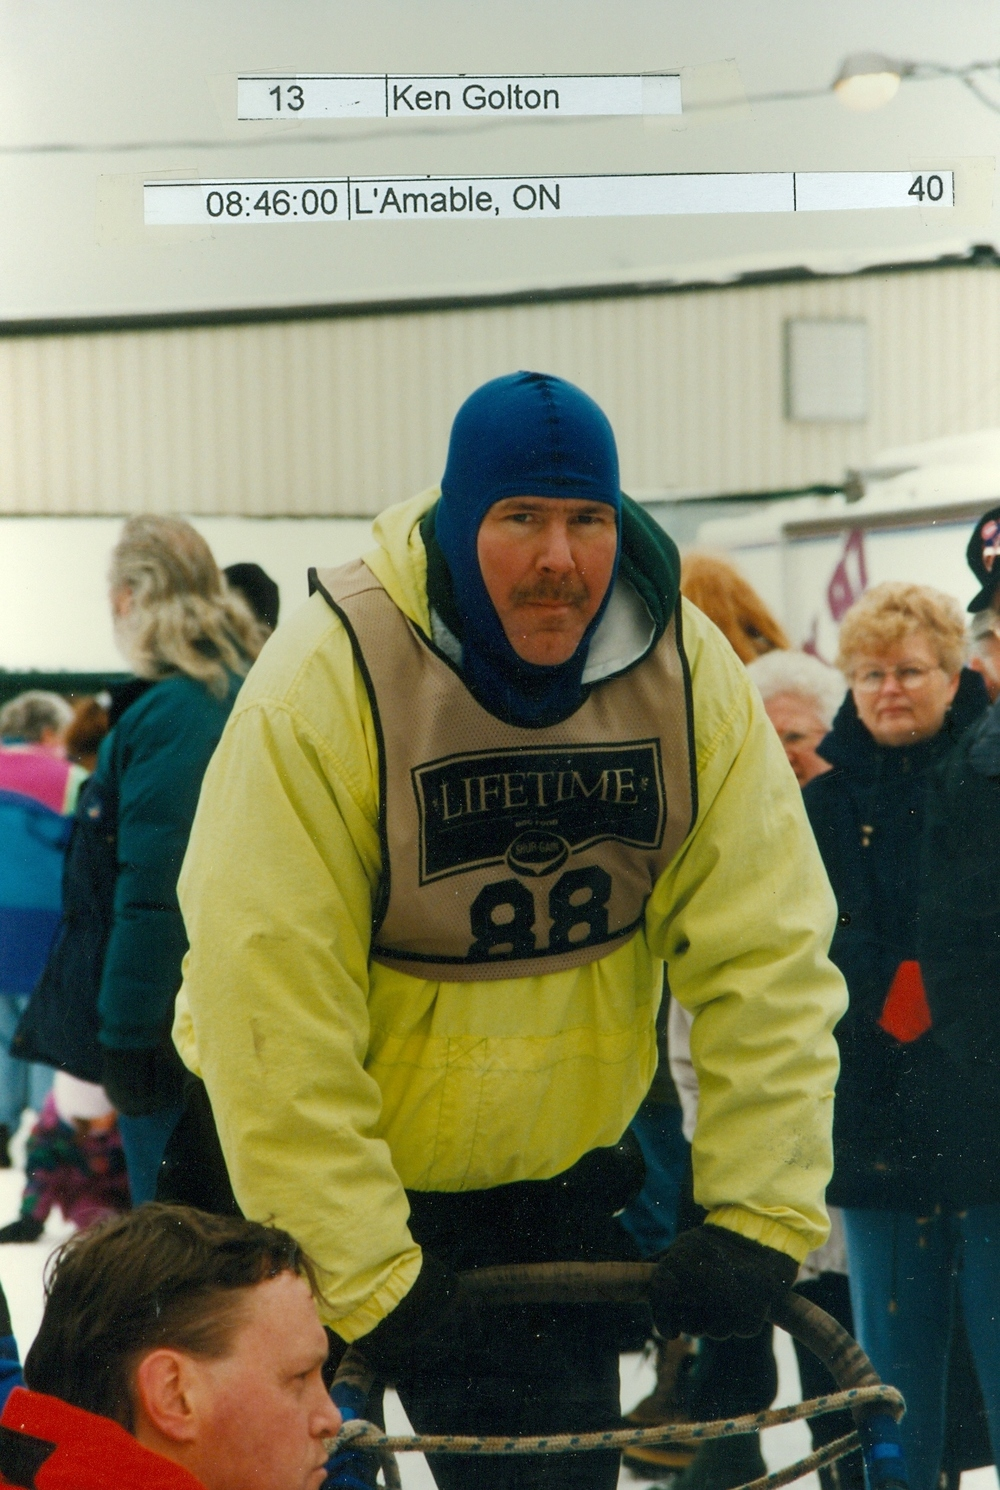 Snofest 1997 Ken Golton, L'Amable, Ontario